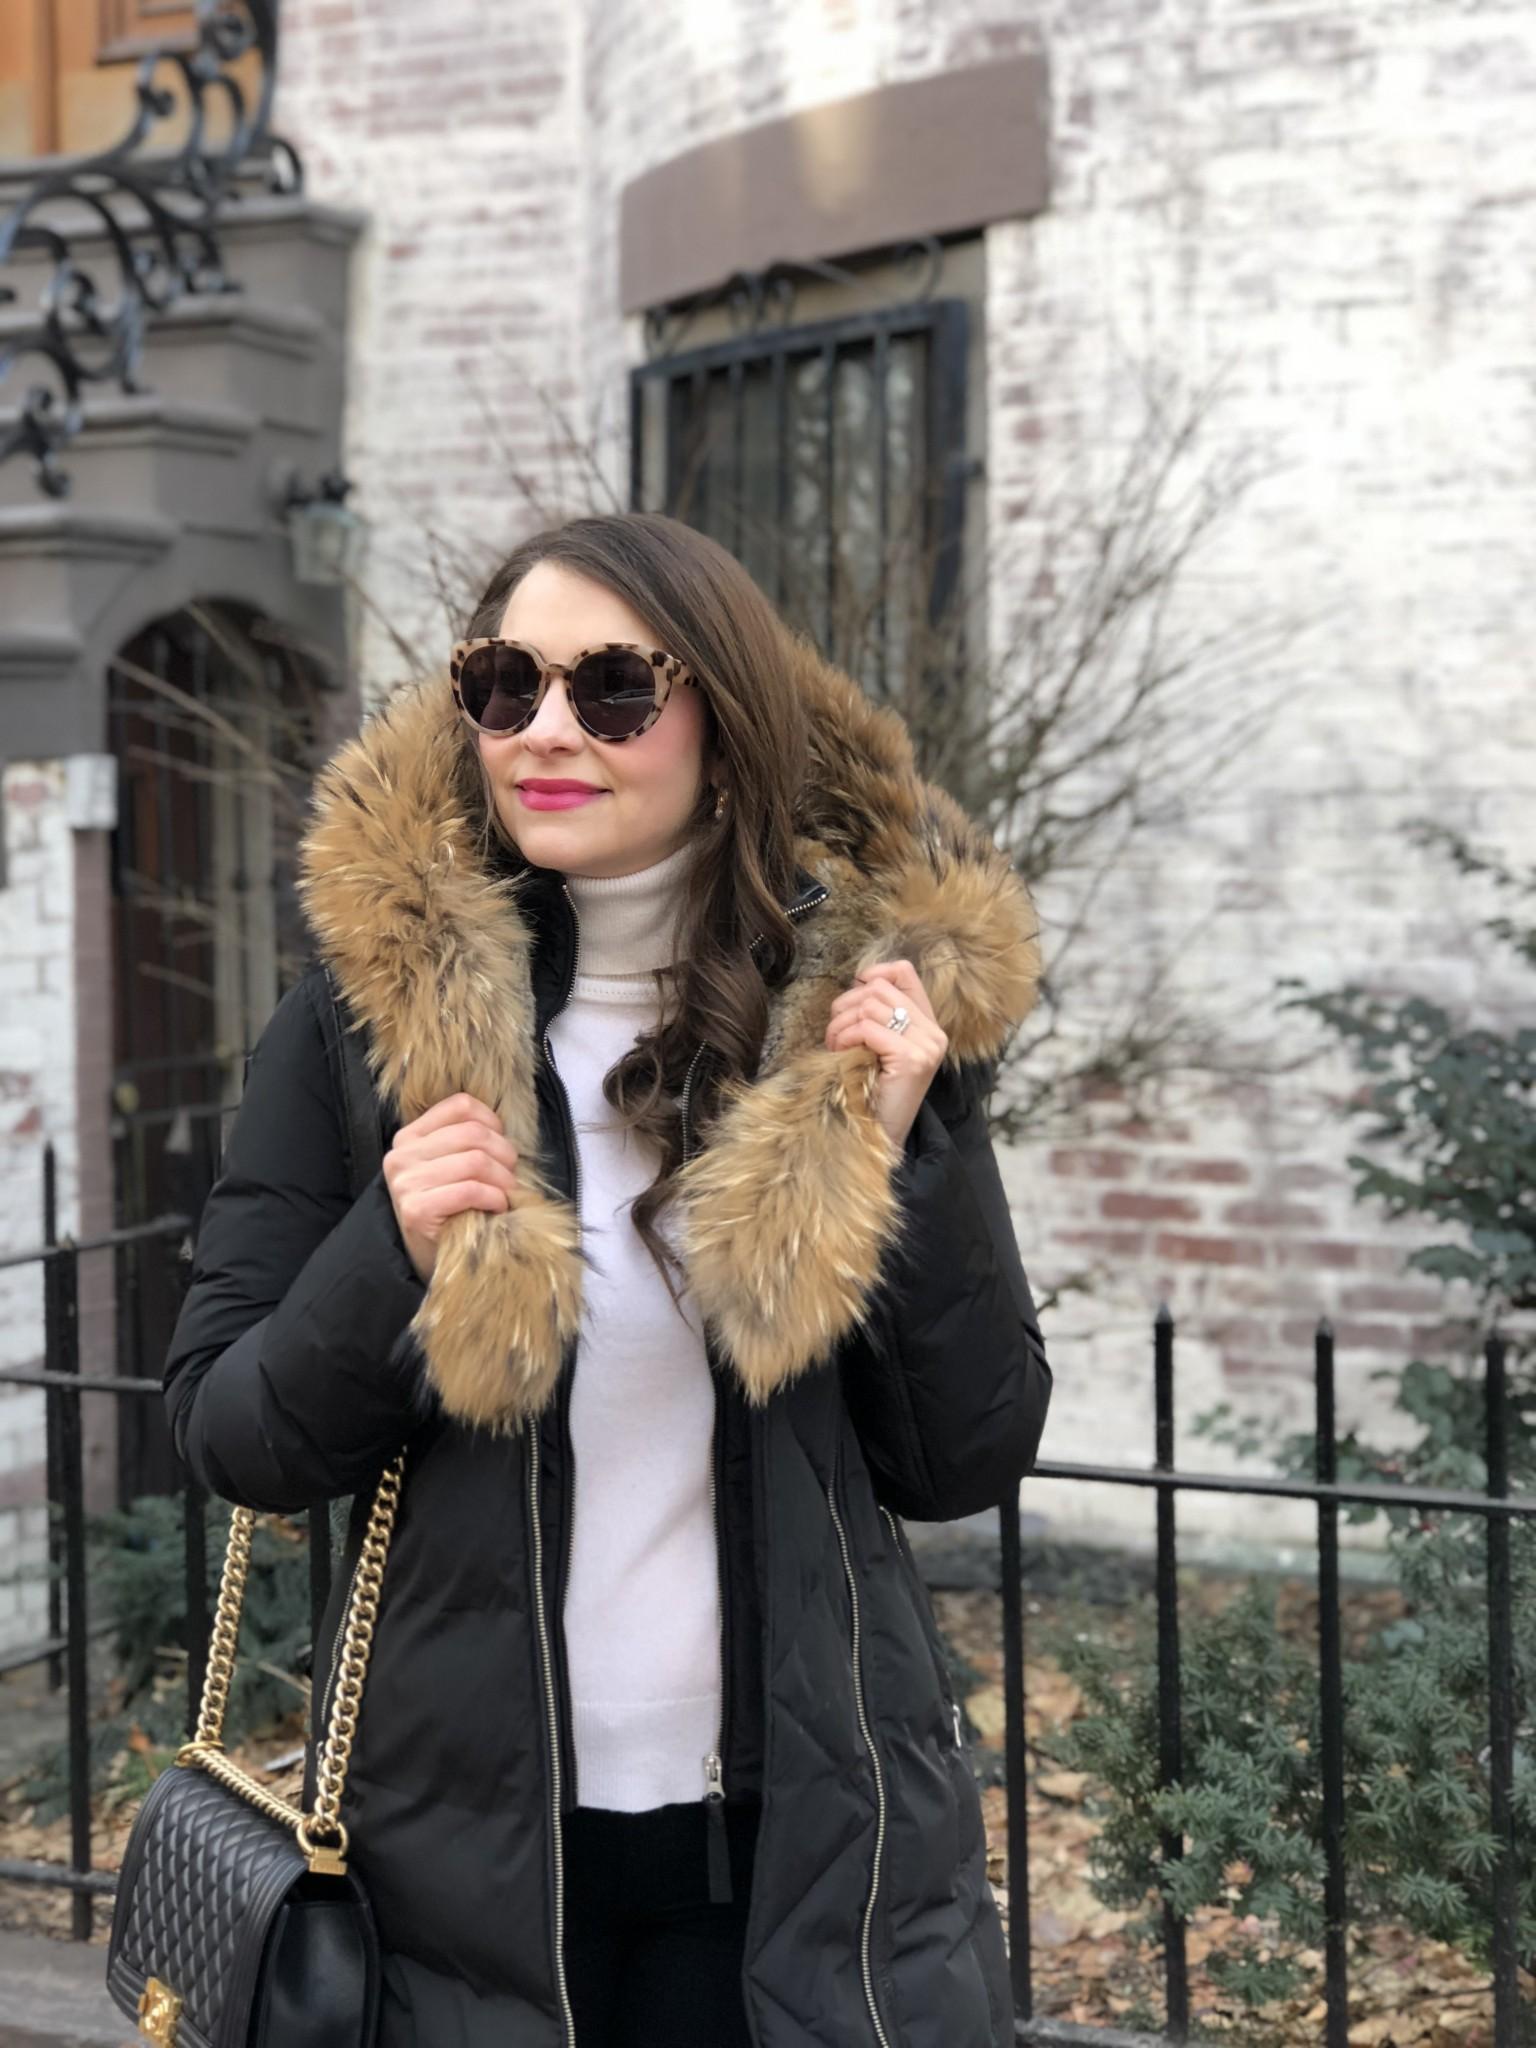 mackage trish coat, stylish winter coats, the-alyst.com